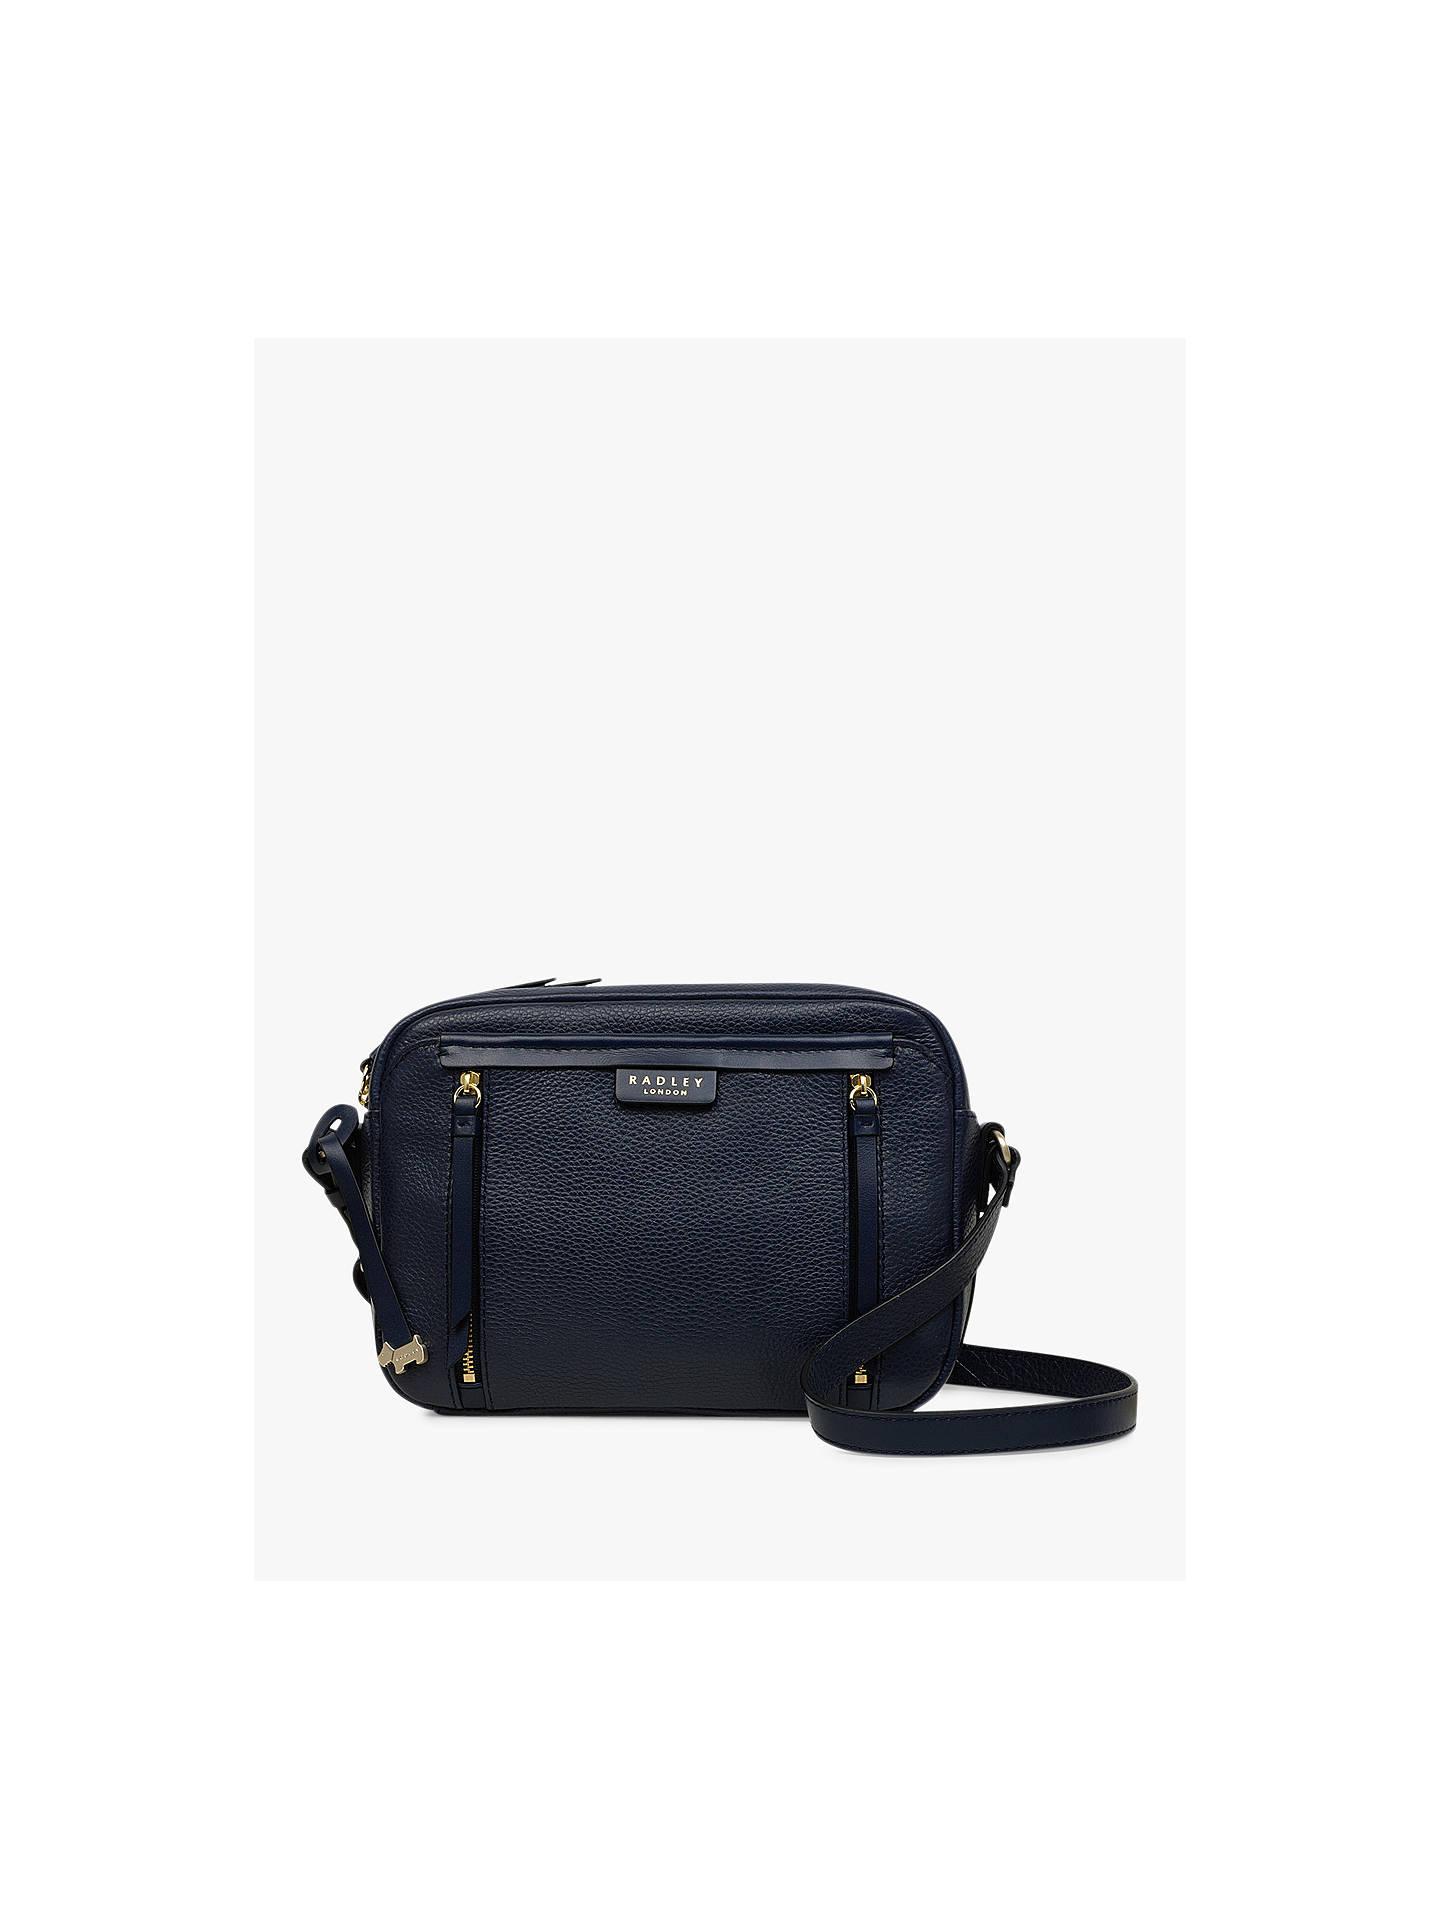 3d29a26309 Buy Radley Penhurst Medium Leather Cross Body Bag